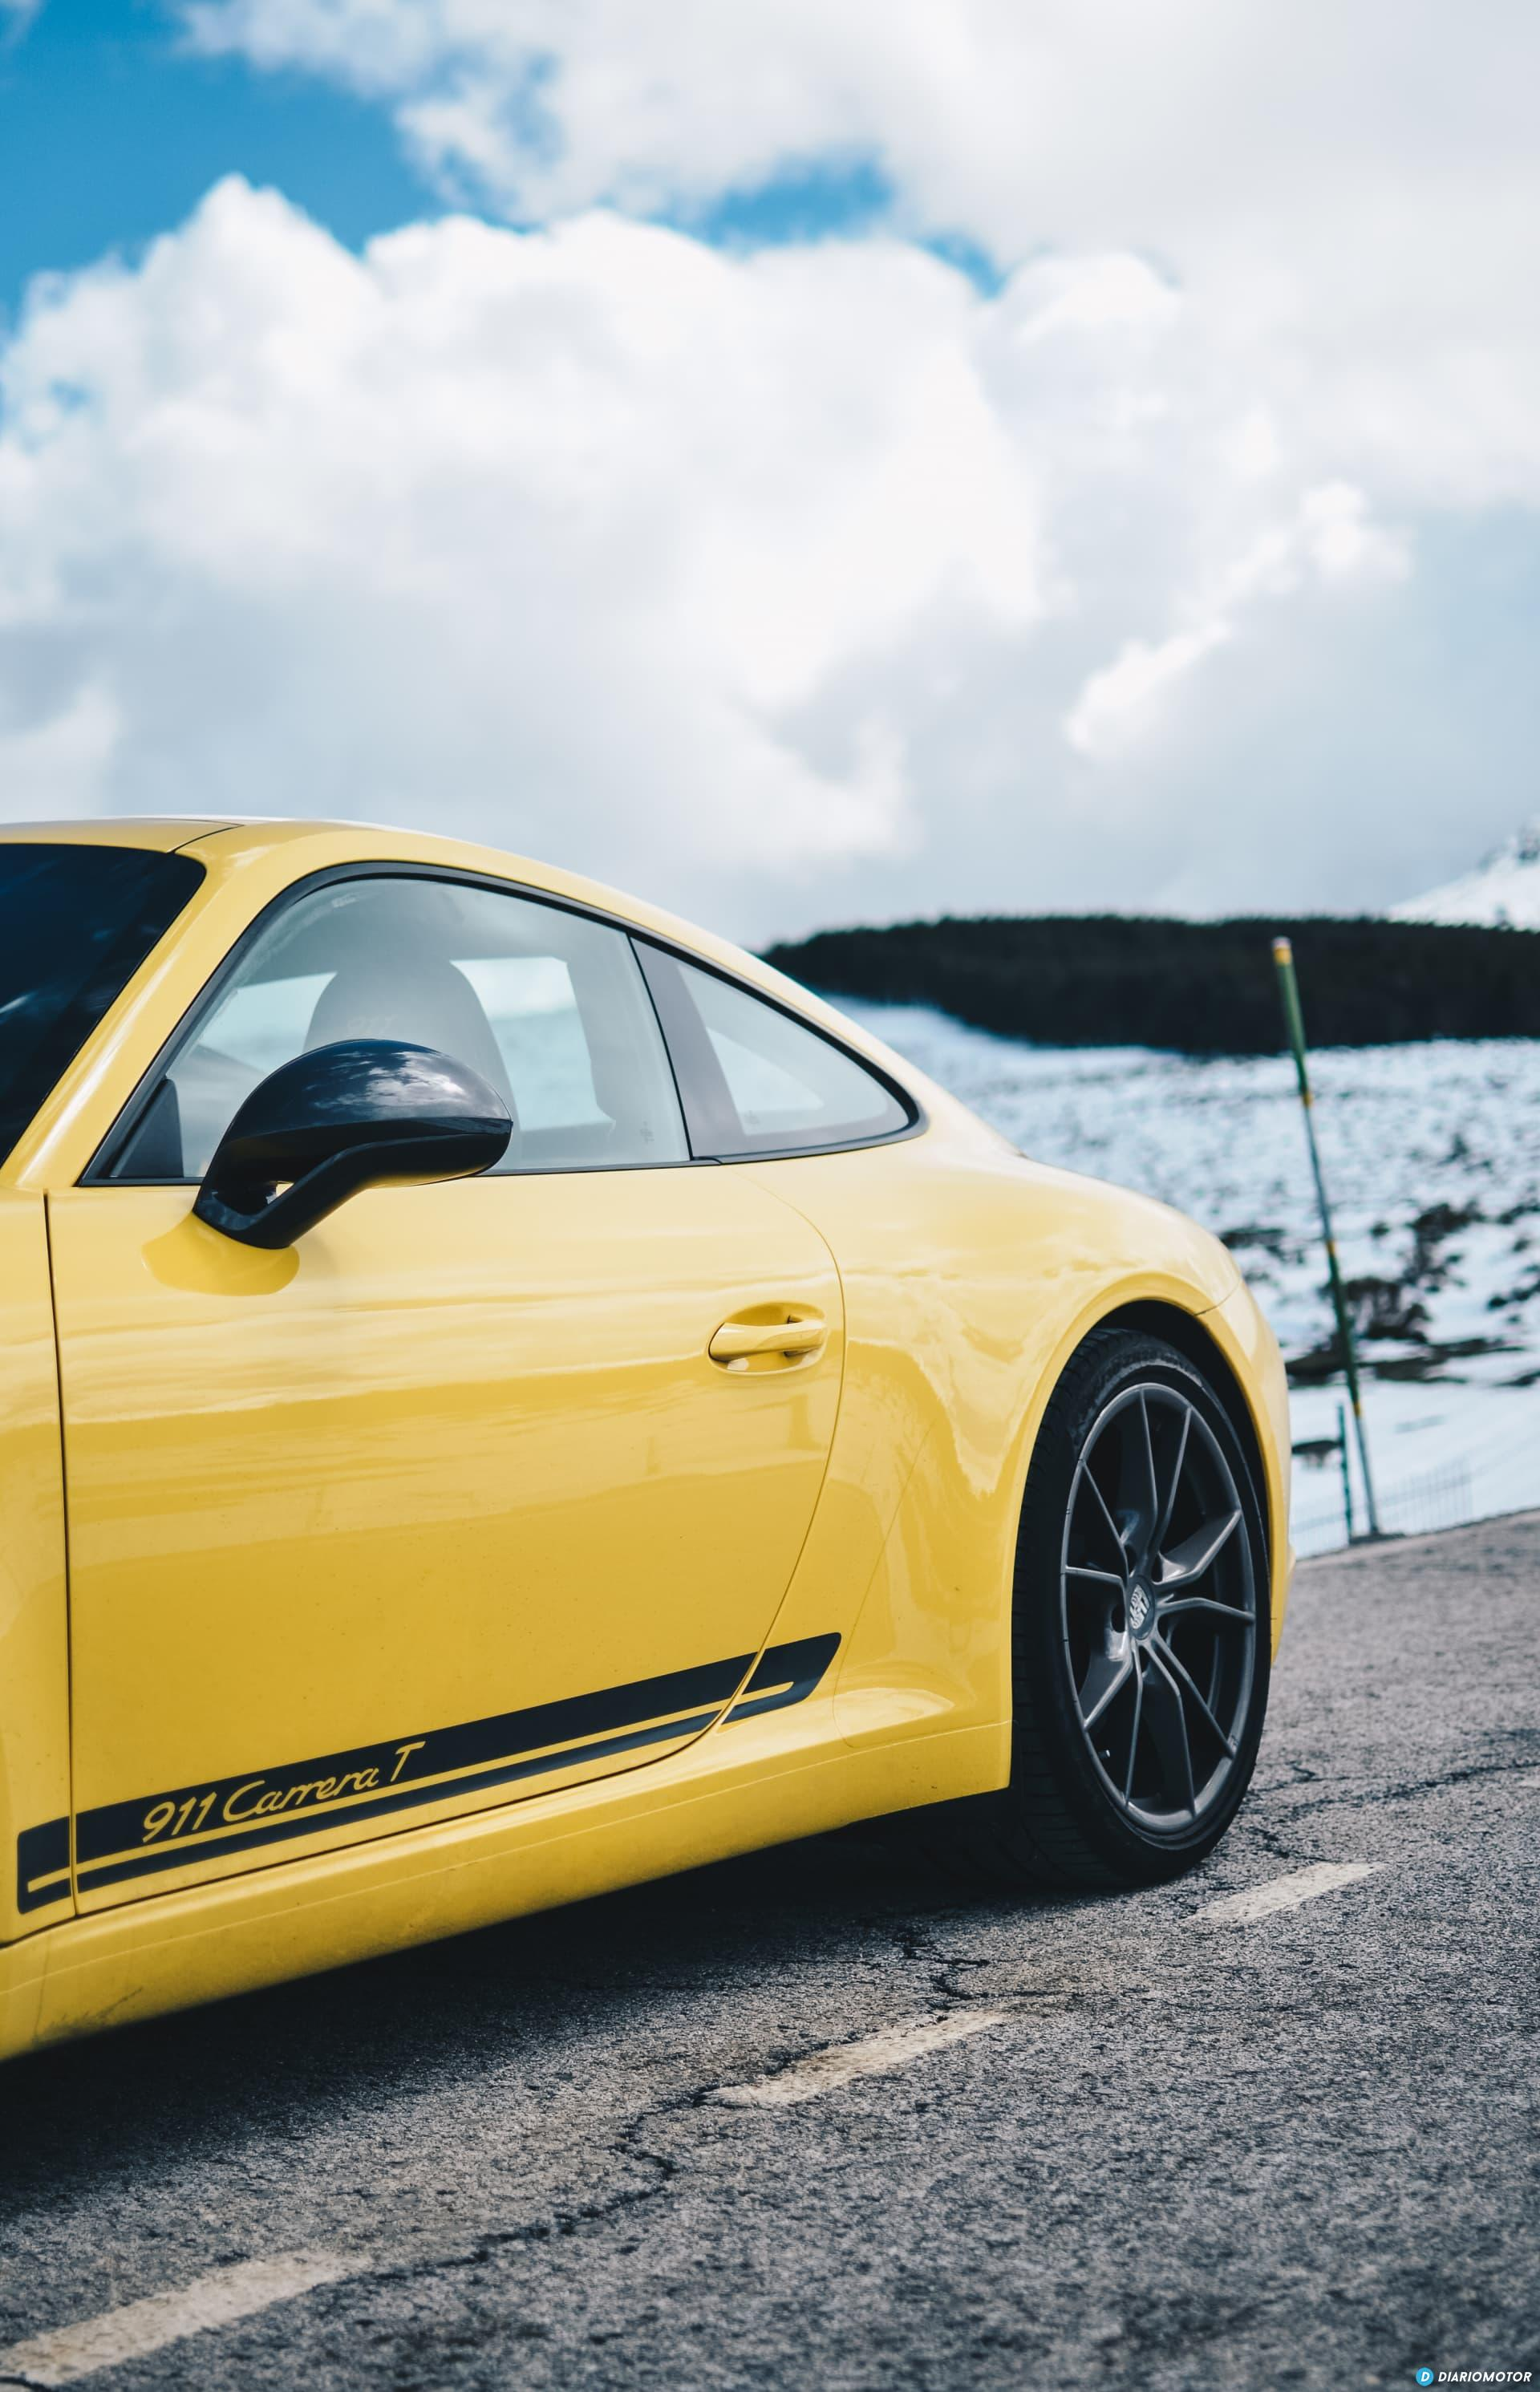 Porsche 911 Carrera 5 15